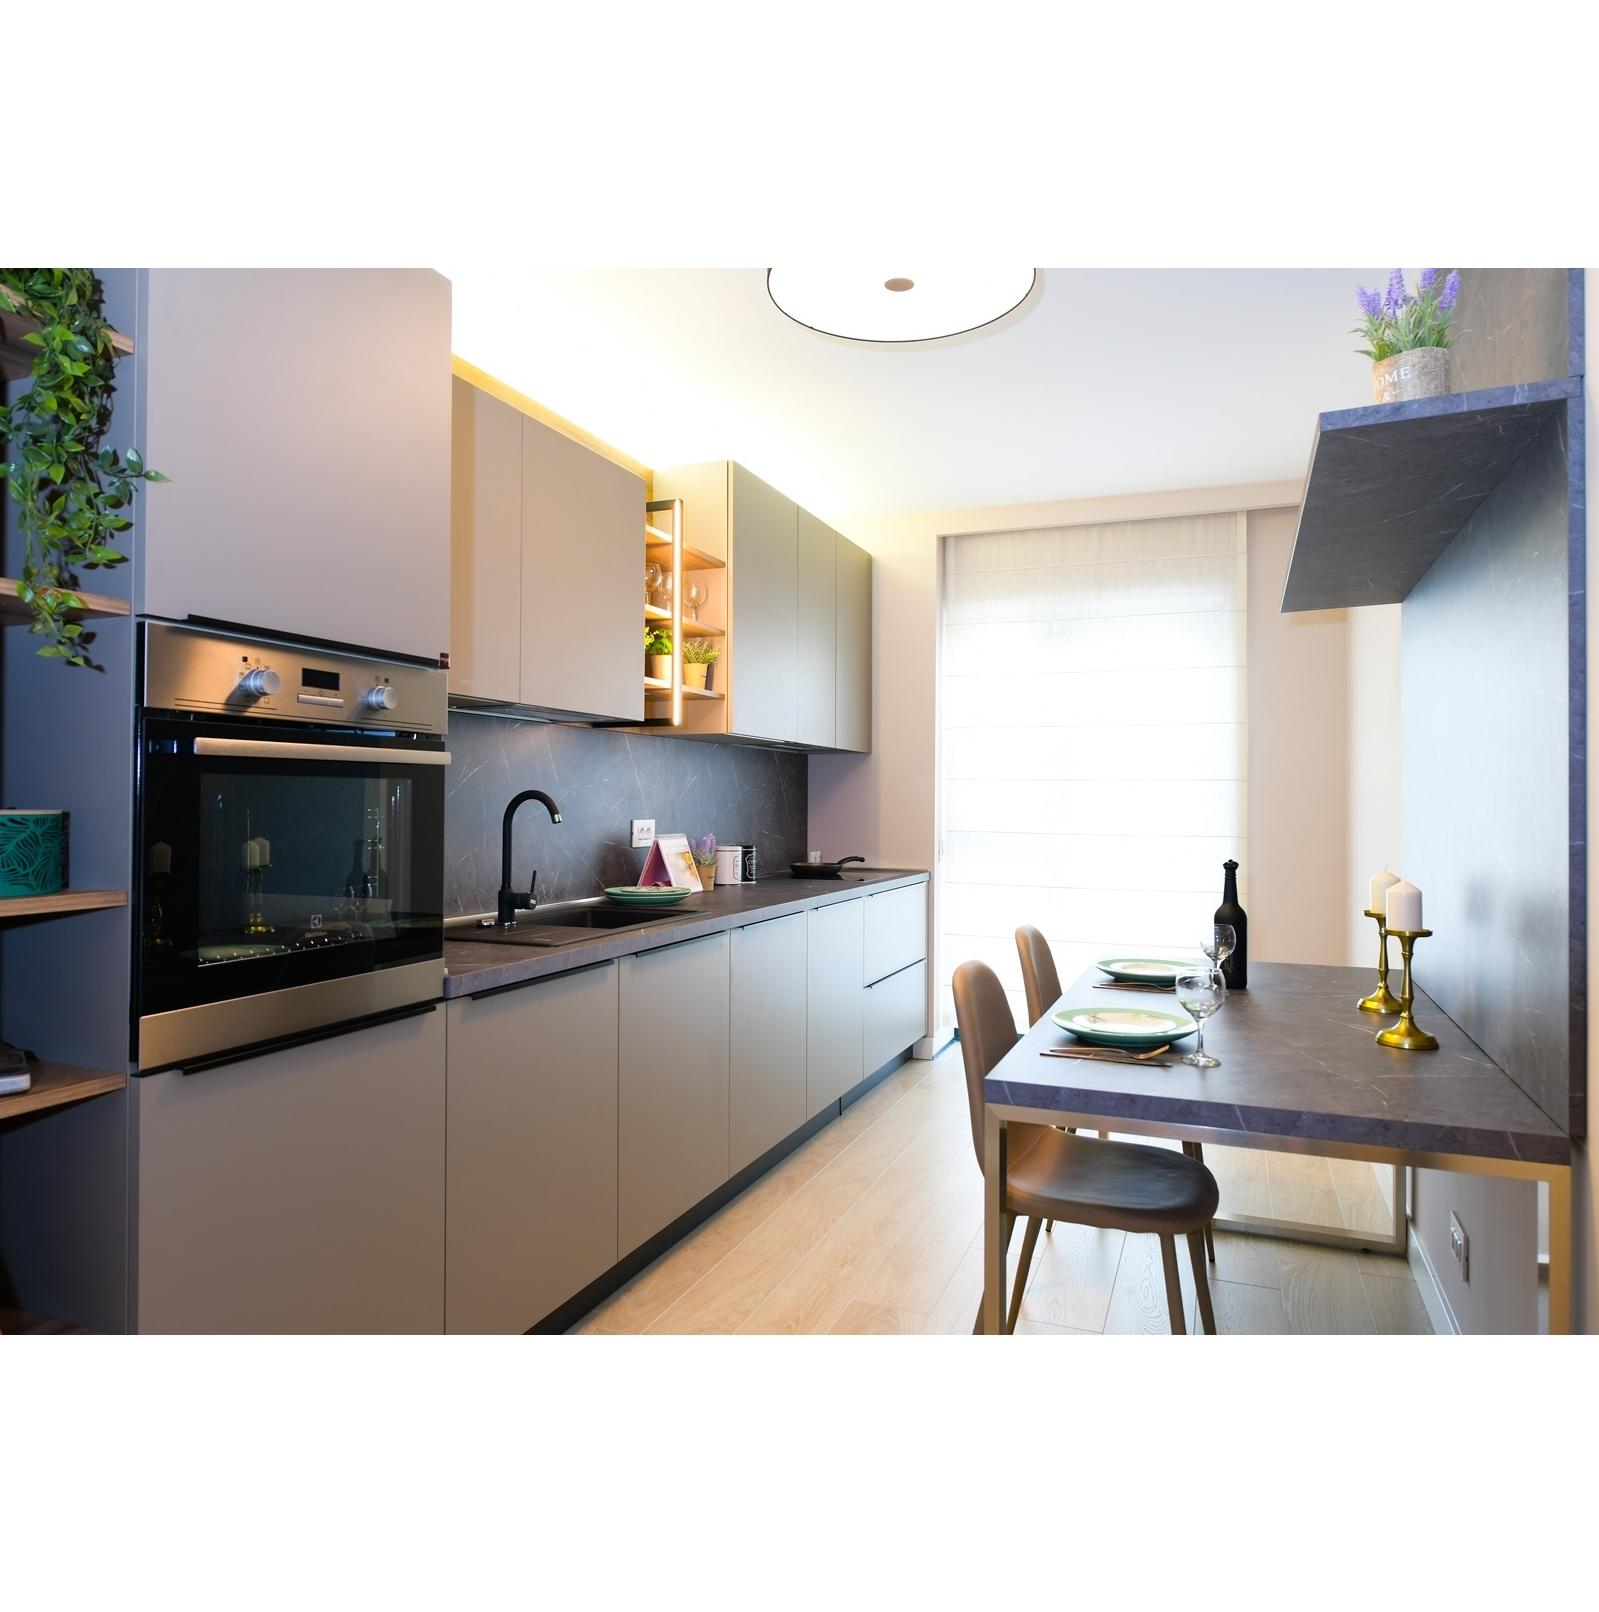 Showroom apartments